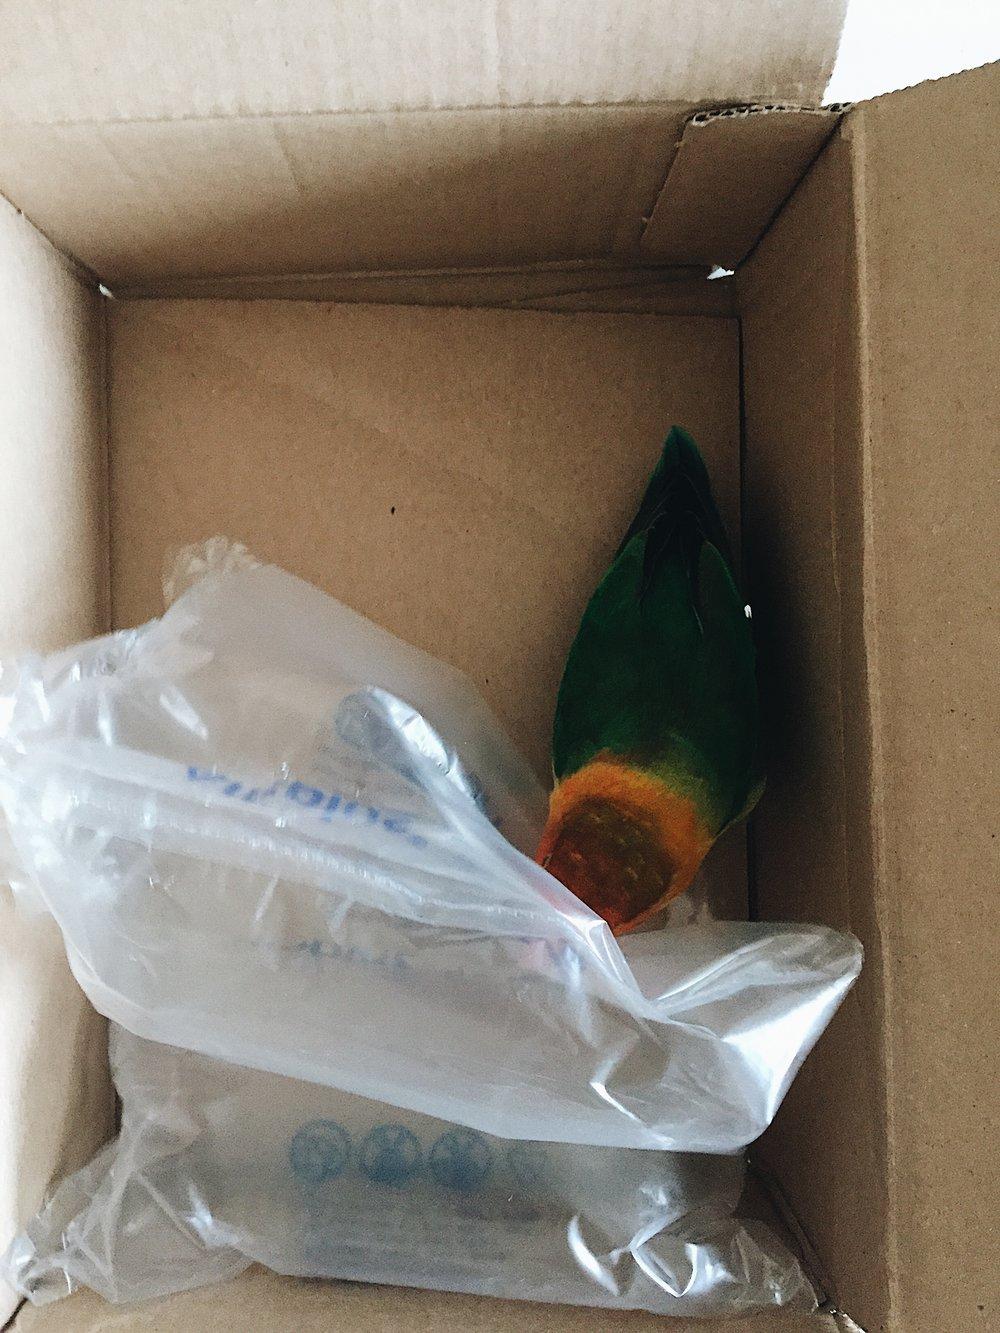 Mango loves mail